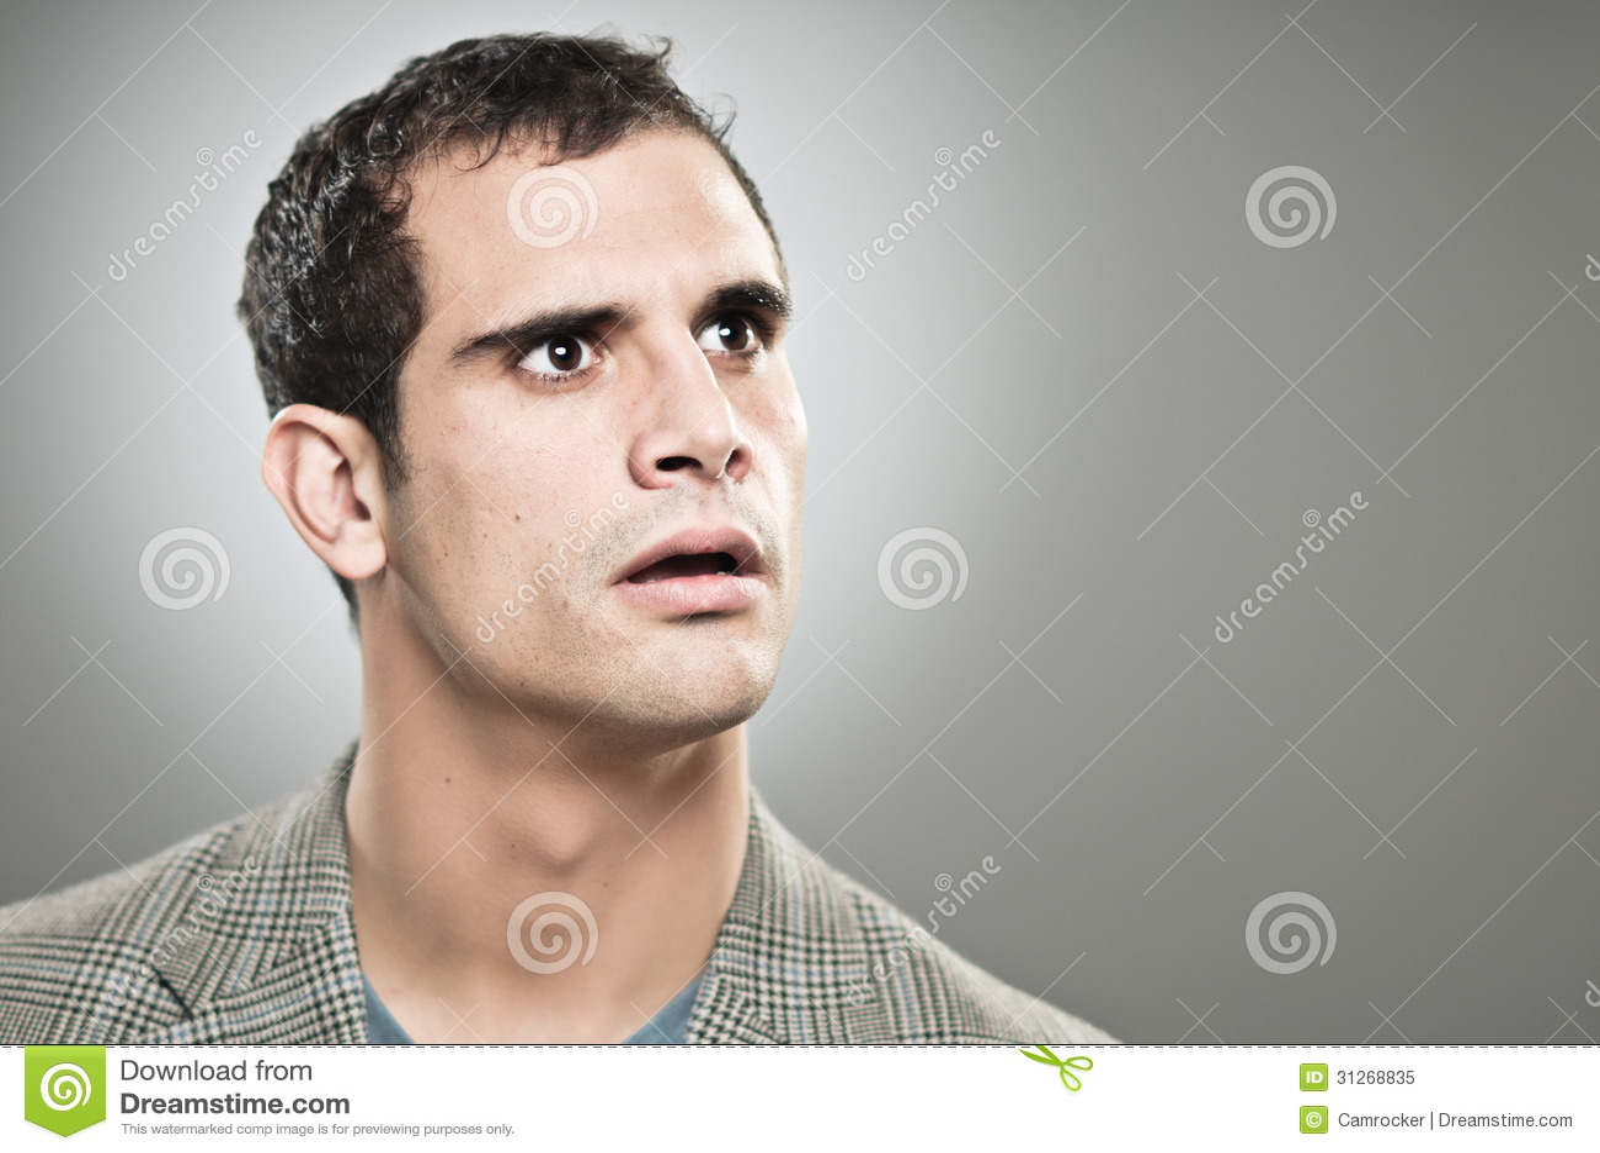 caucasian man worried expression portrtait stock image